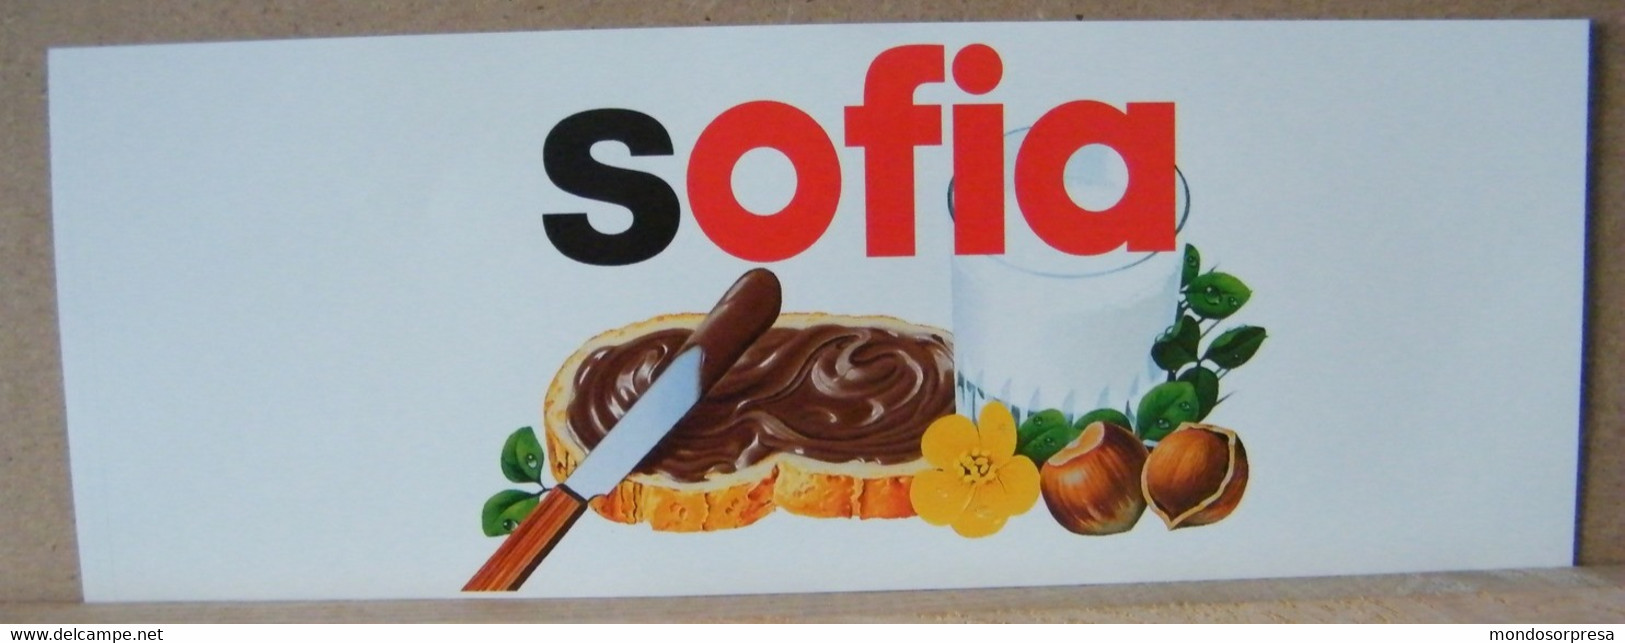 MONDOSORPRESA, ADESIVI NUTELLA NOMI, SOFIA - Nutella